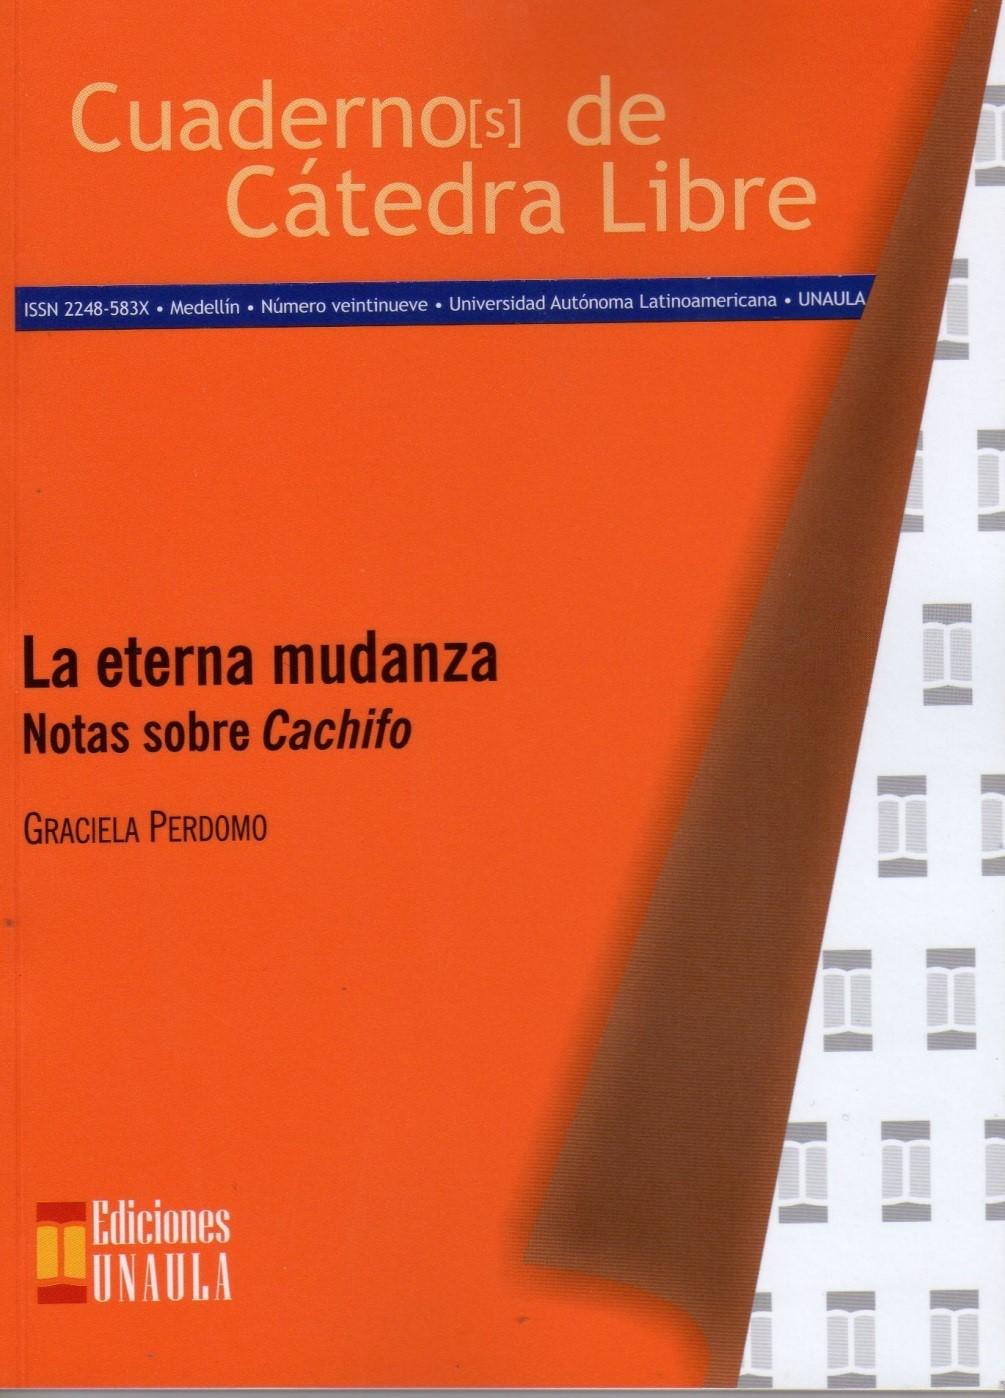 LA ETERNA MUDANZA / NOTAS SOBRE CACHIFO / GRACIELA PERDOMO | Mecánica  Celeste